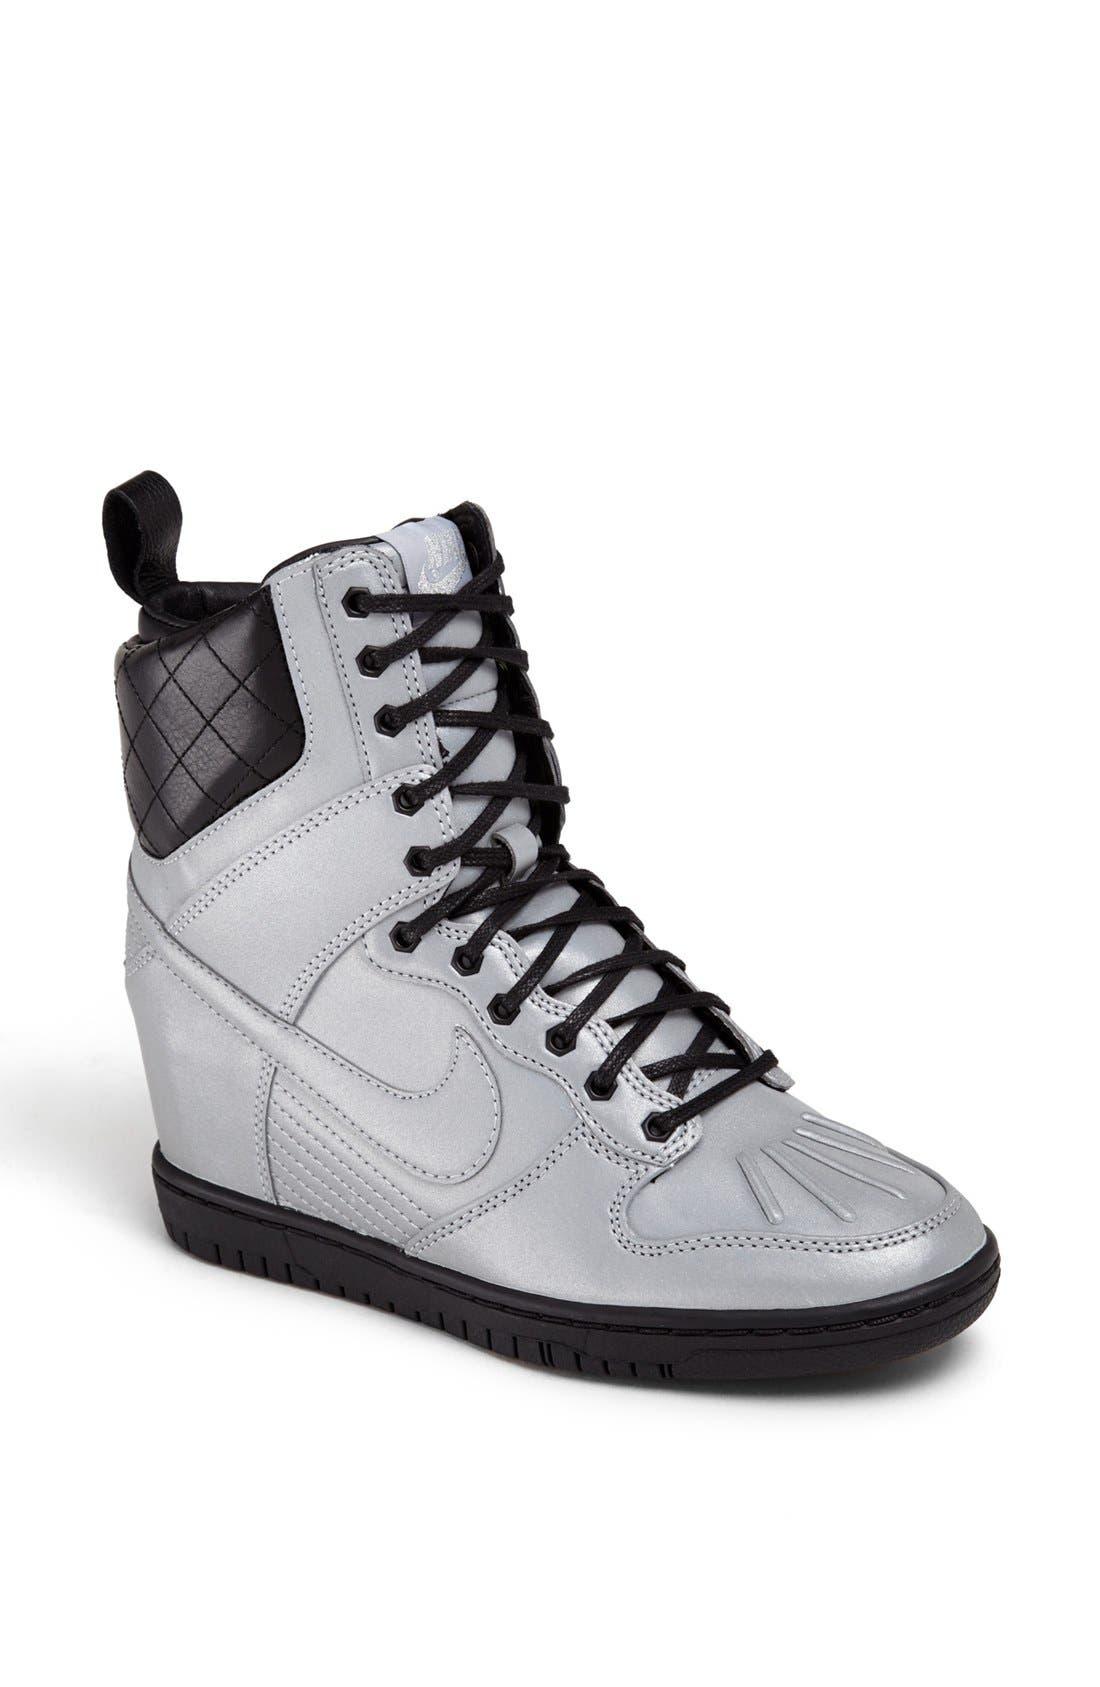 Main Image - Nike 'Dunk Sky Hi' Hidden Wedge Sneaker Boot (Women)